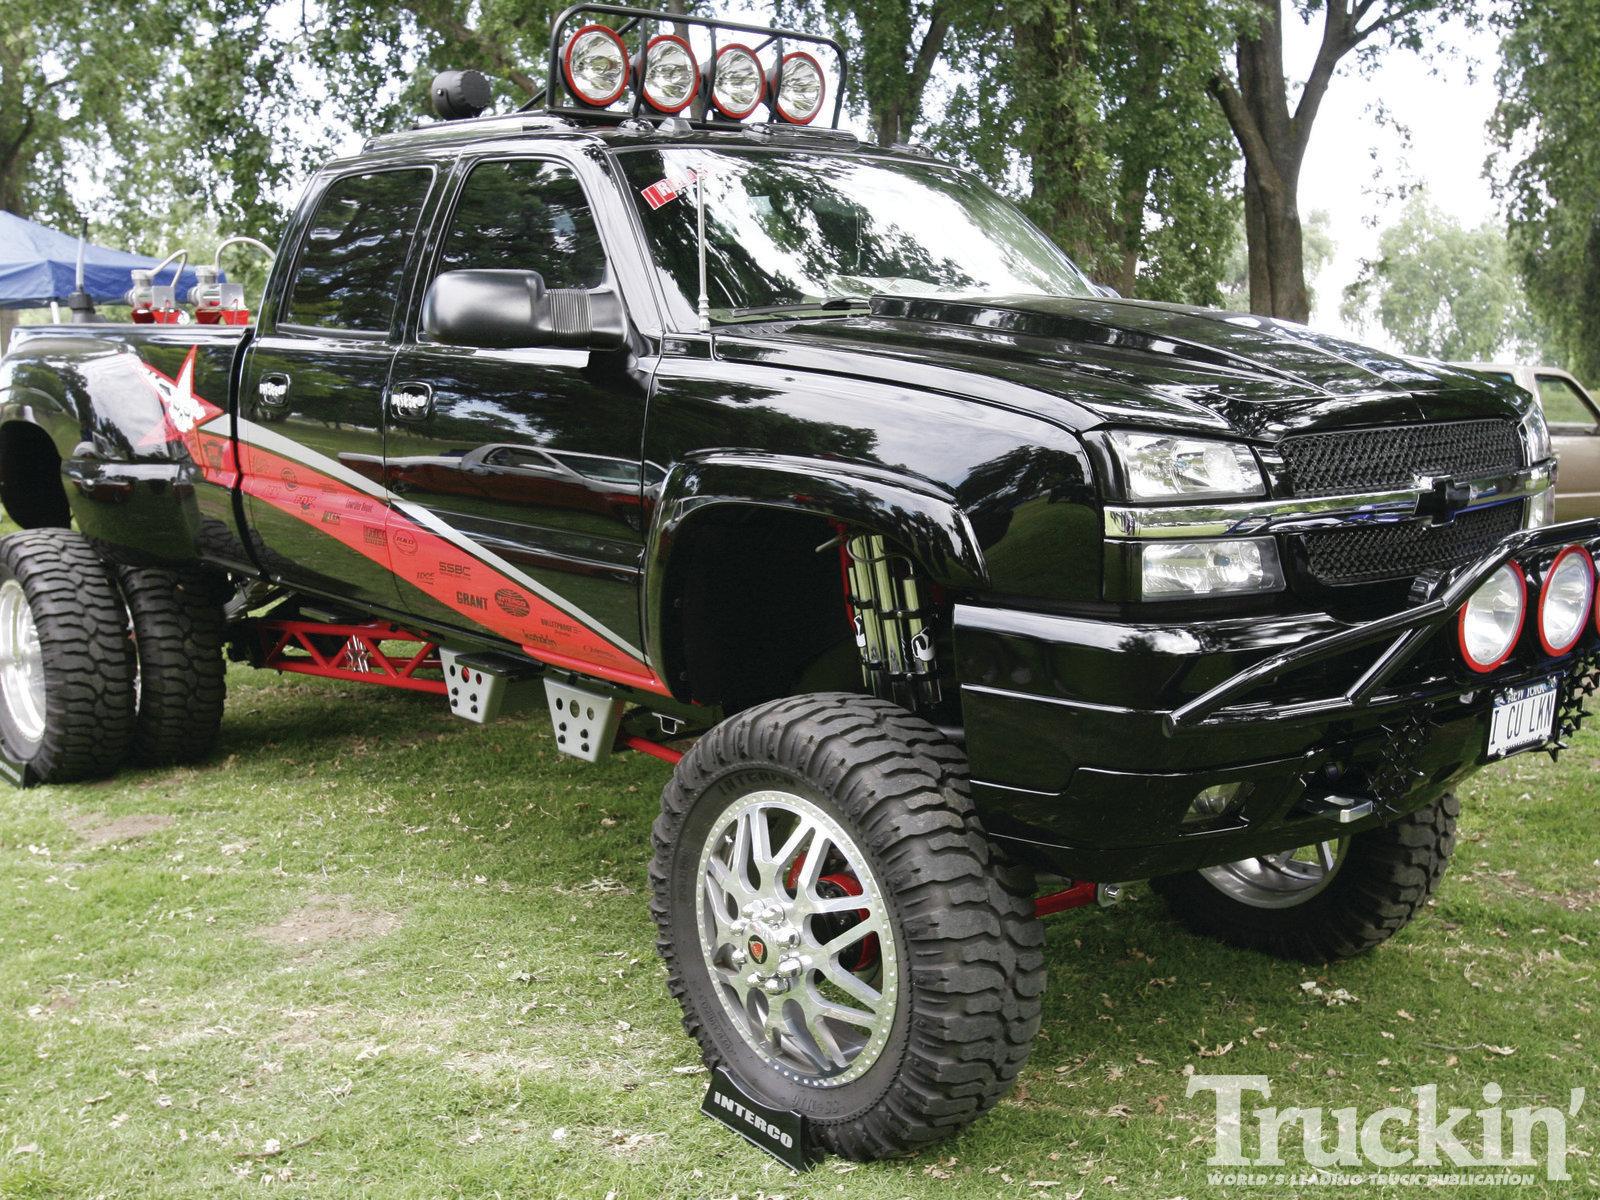 Lifted Chevy Trucks Wallpaper Wallpapersafari